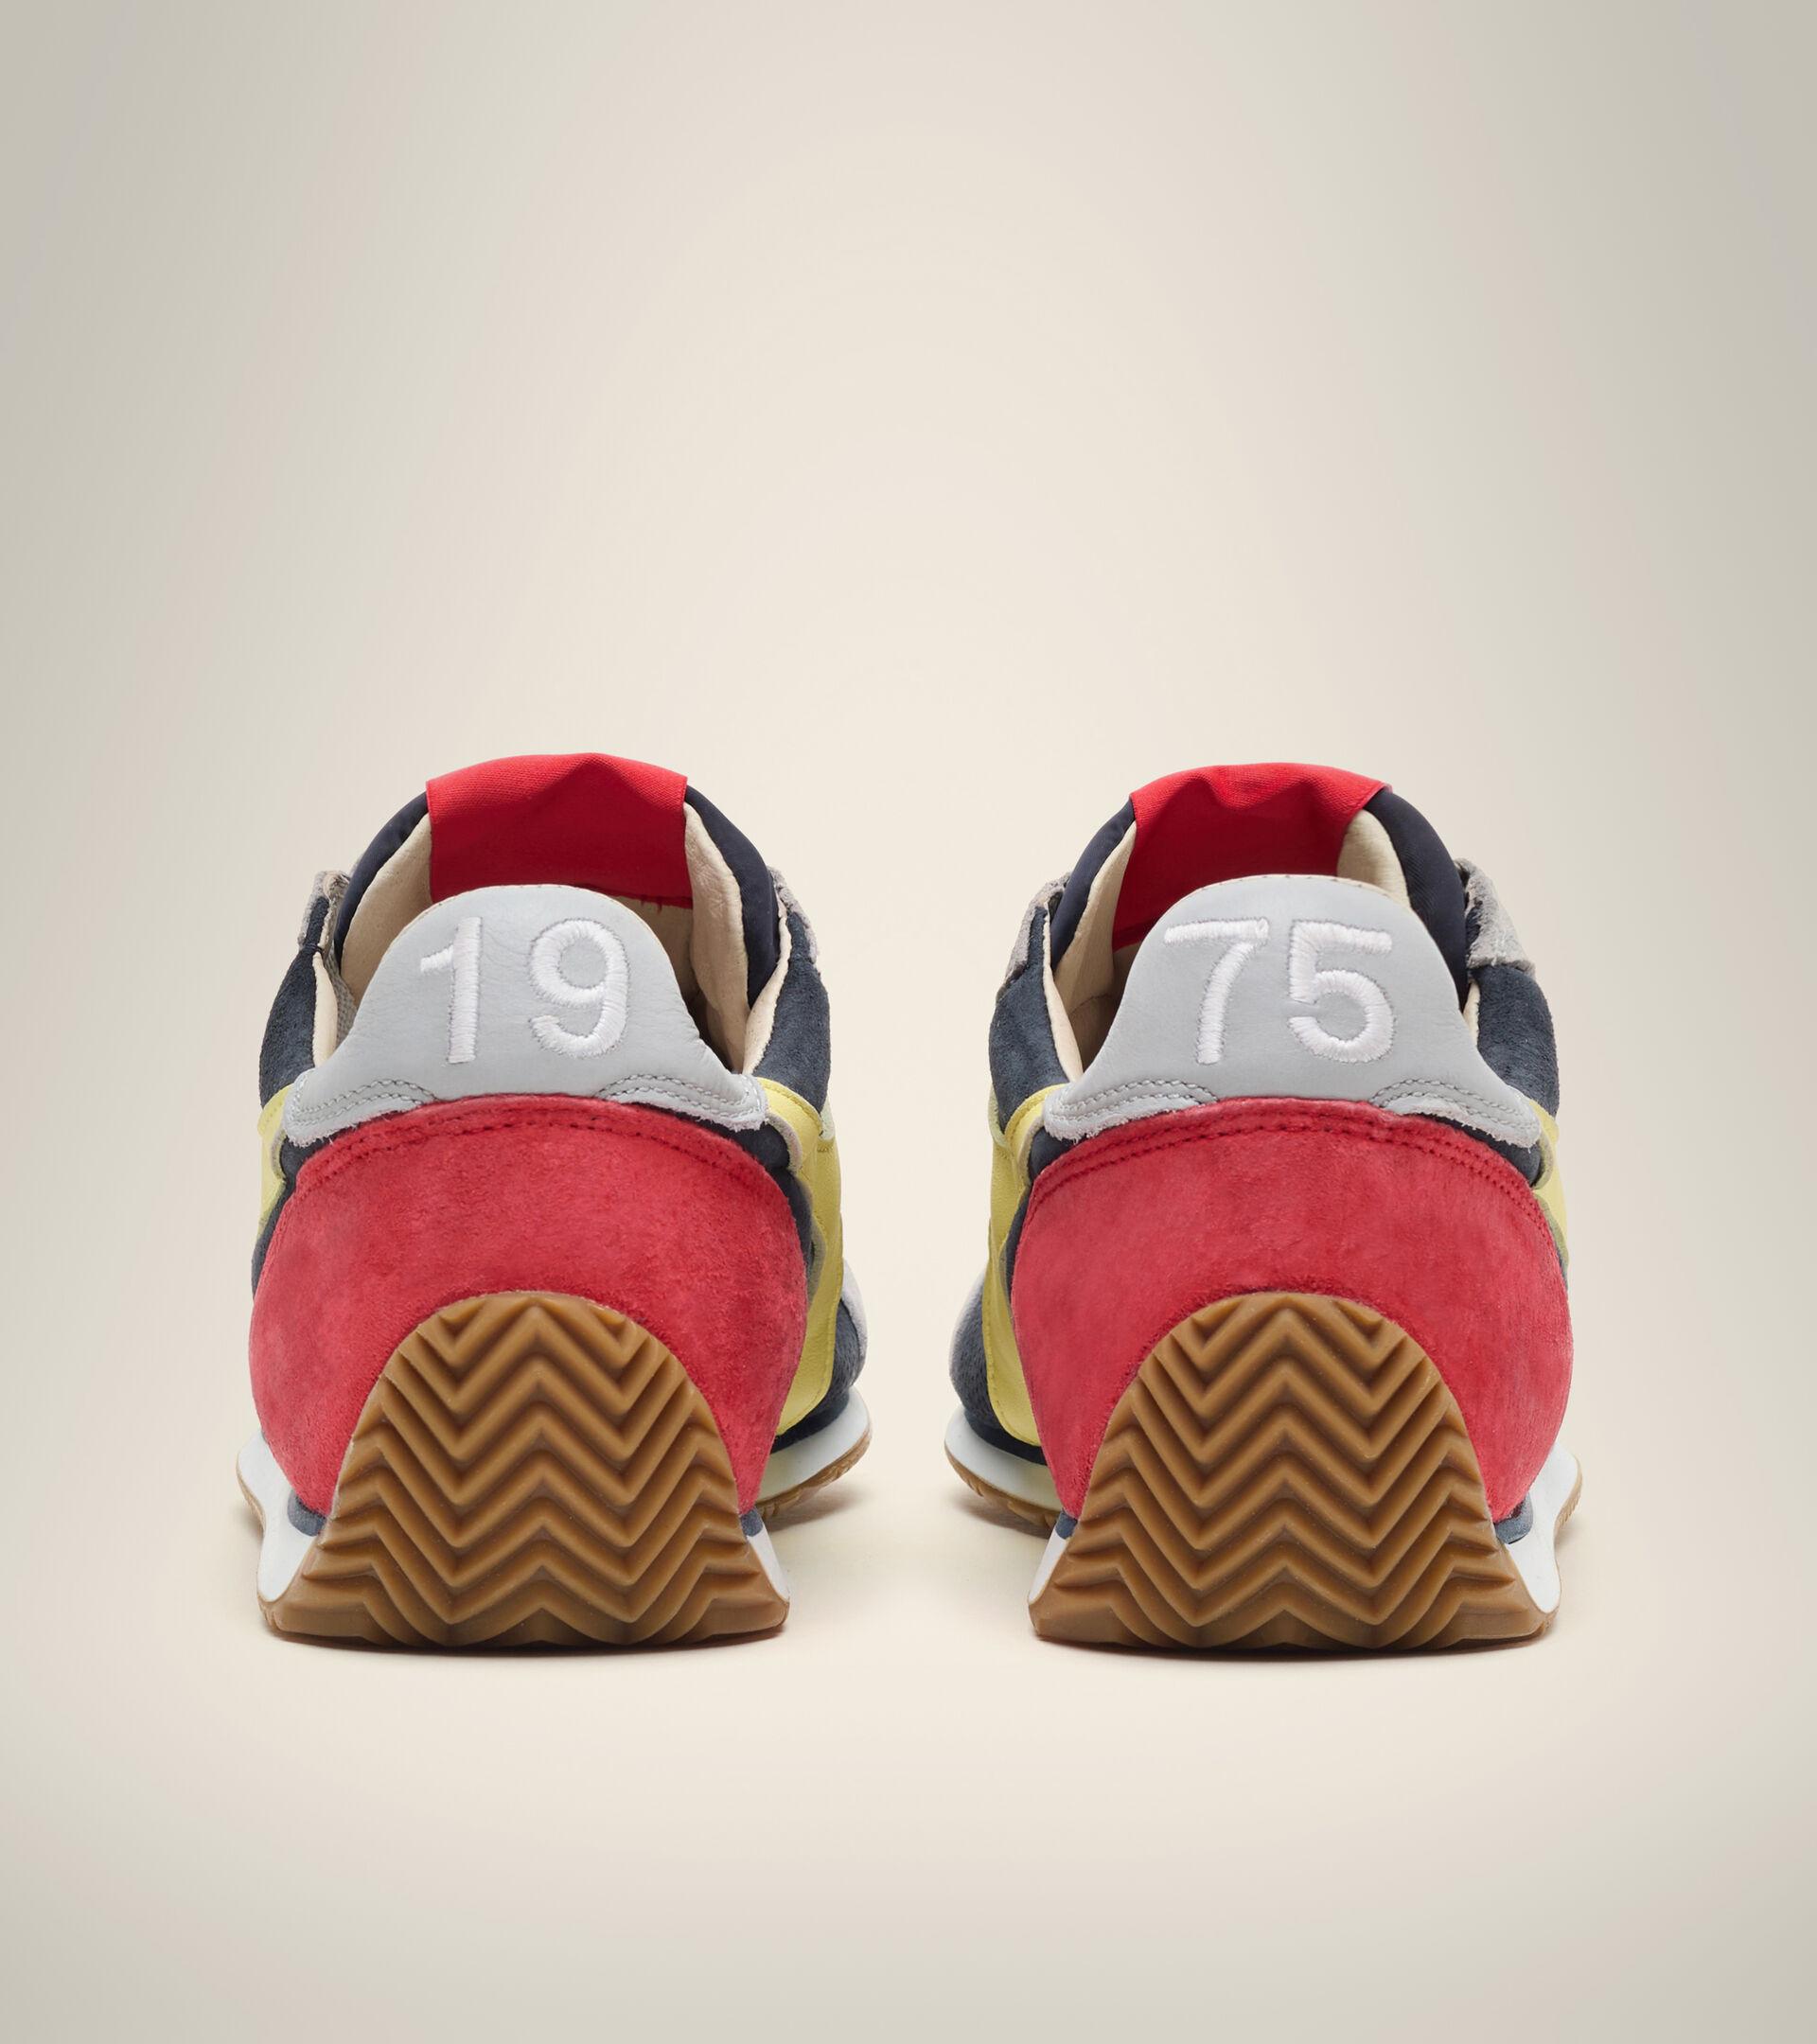 Footwear Heritage UNISEX EQUIPE SUEDE SW BLUE DENIM/HIGH RISE Diadora